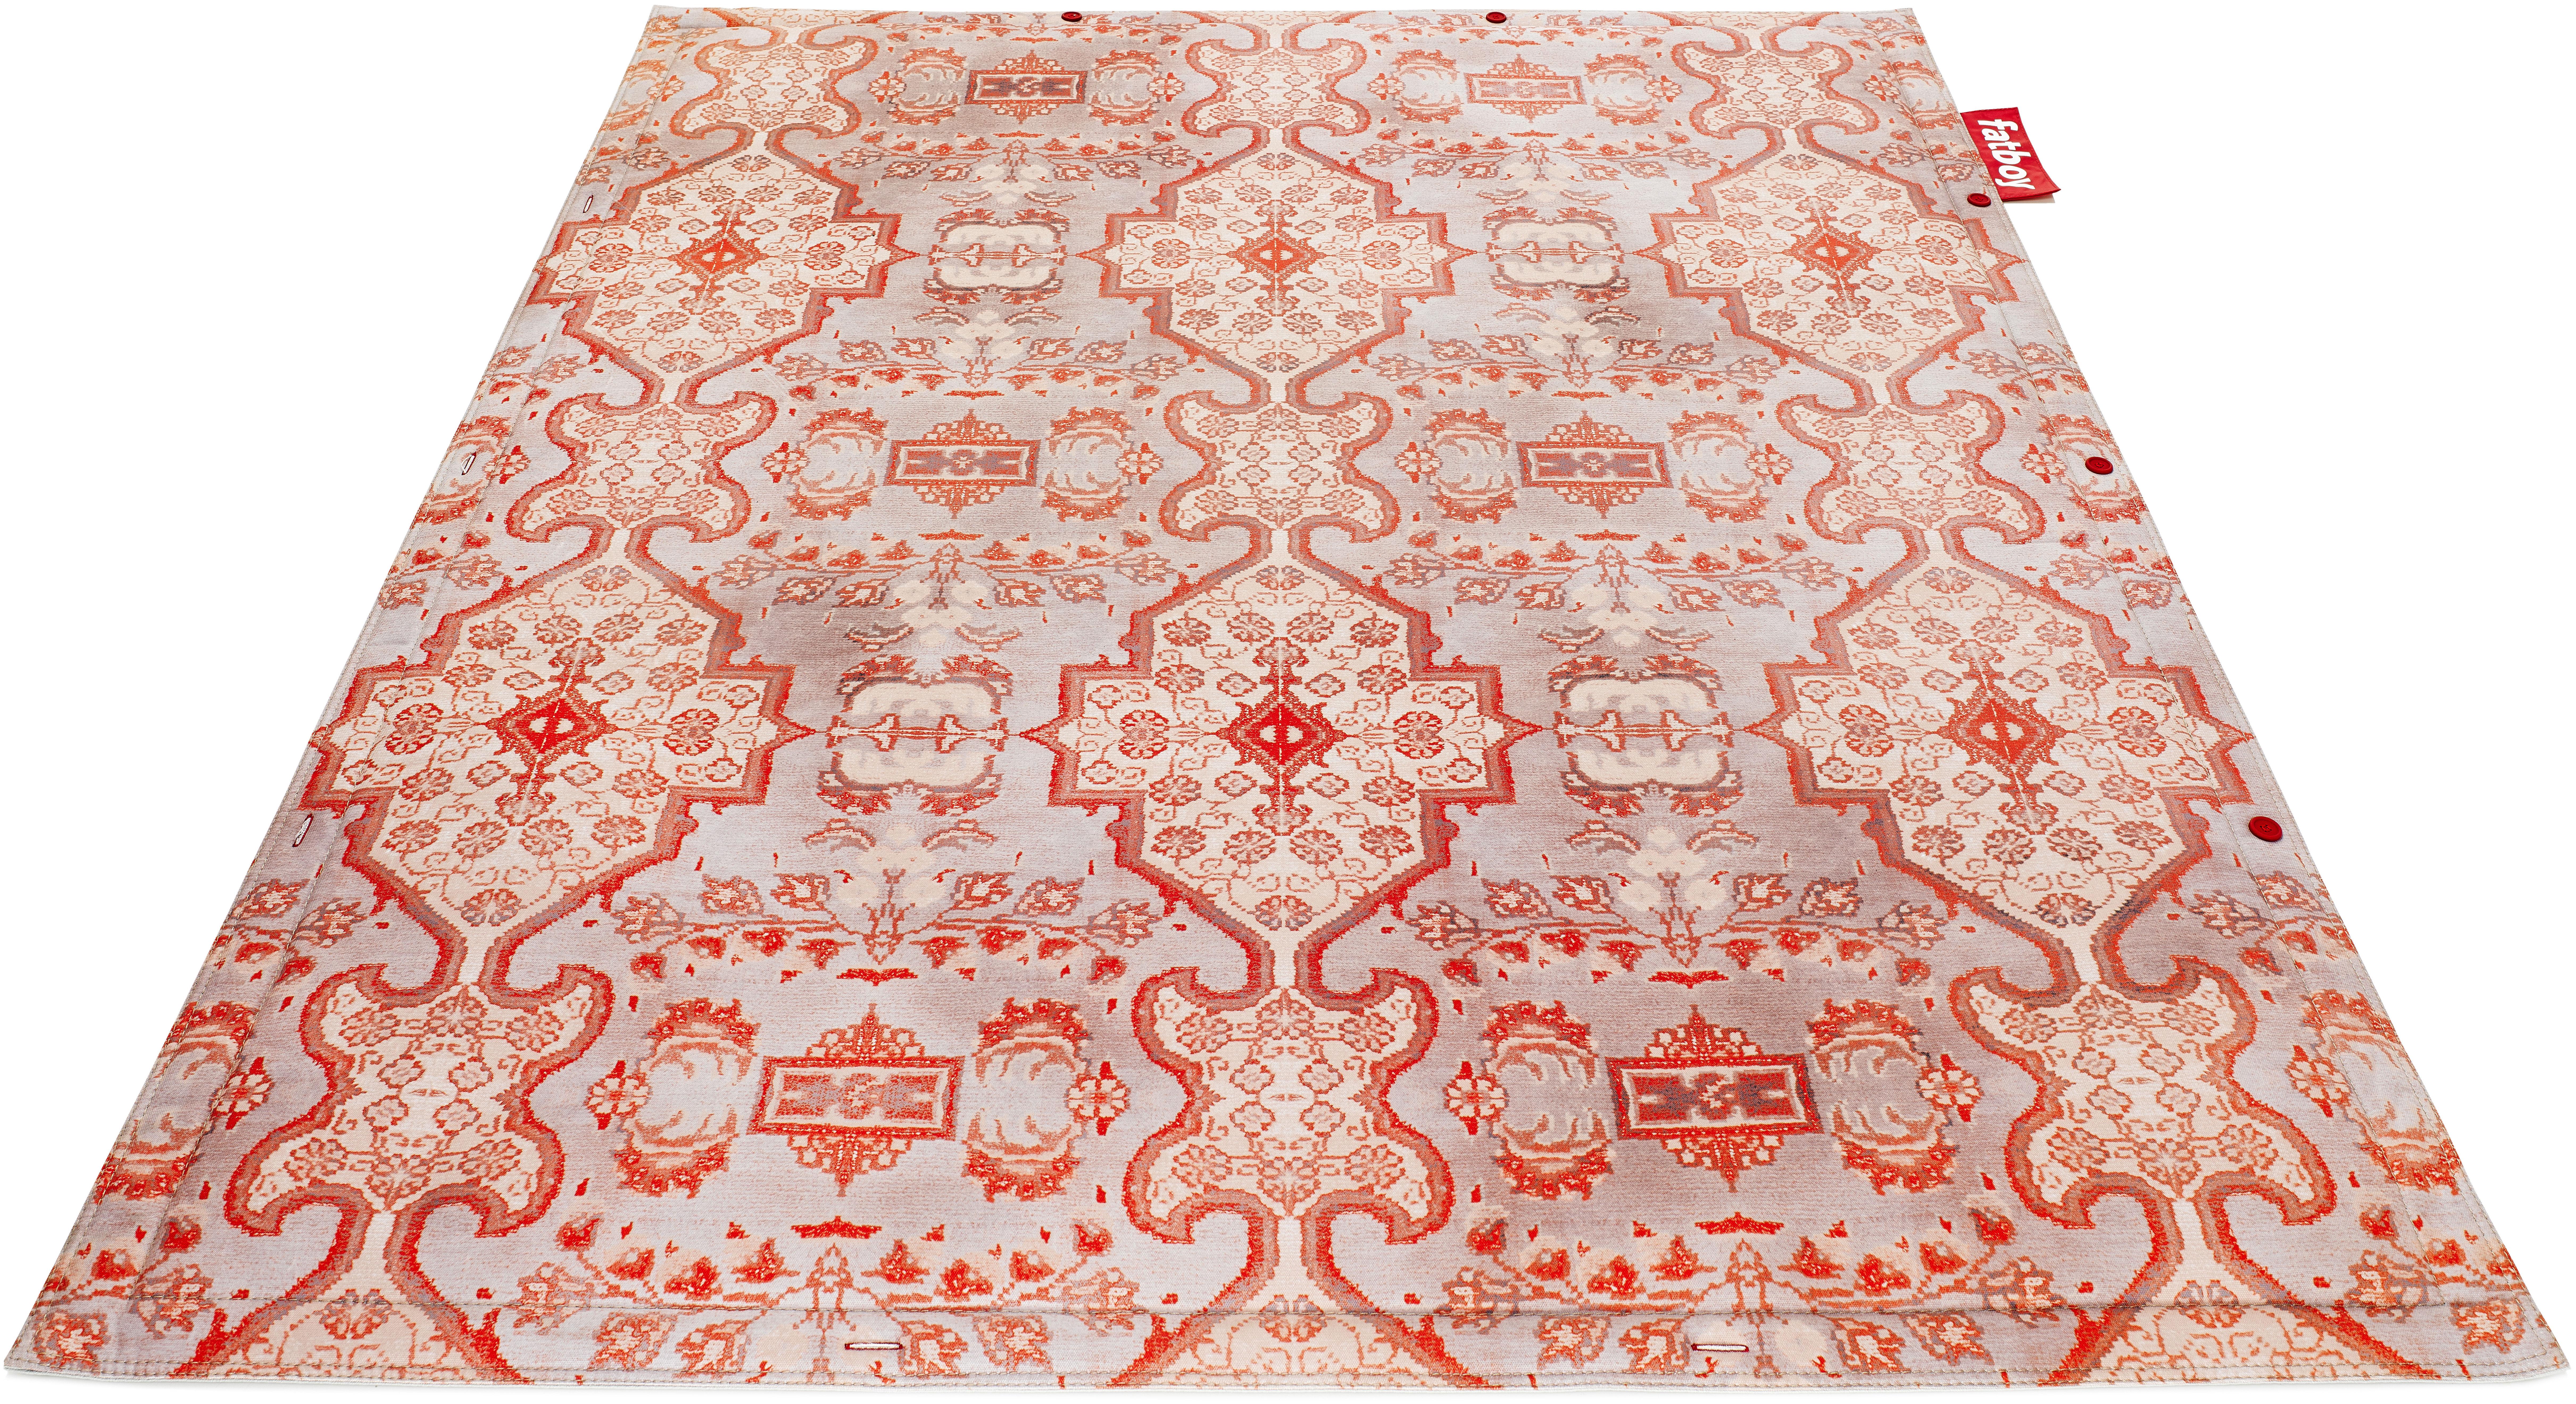 Möbel - Teppiche - Non-Flying Carpet Teppich / 180 x 140 cm - Fatboy - Small Persan, orange - Textile synthétique